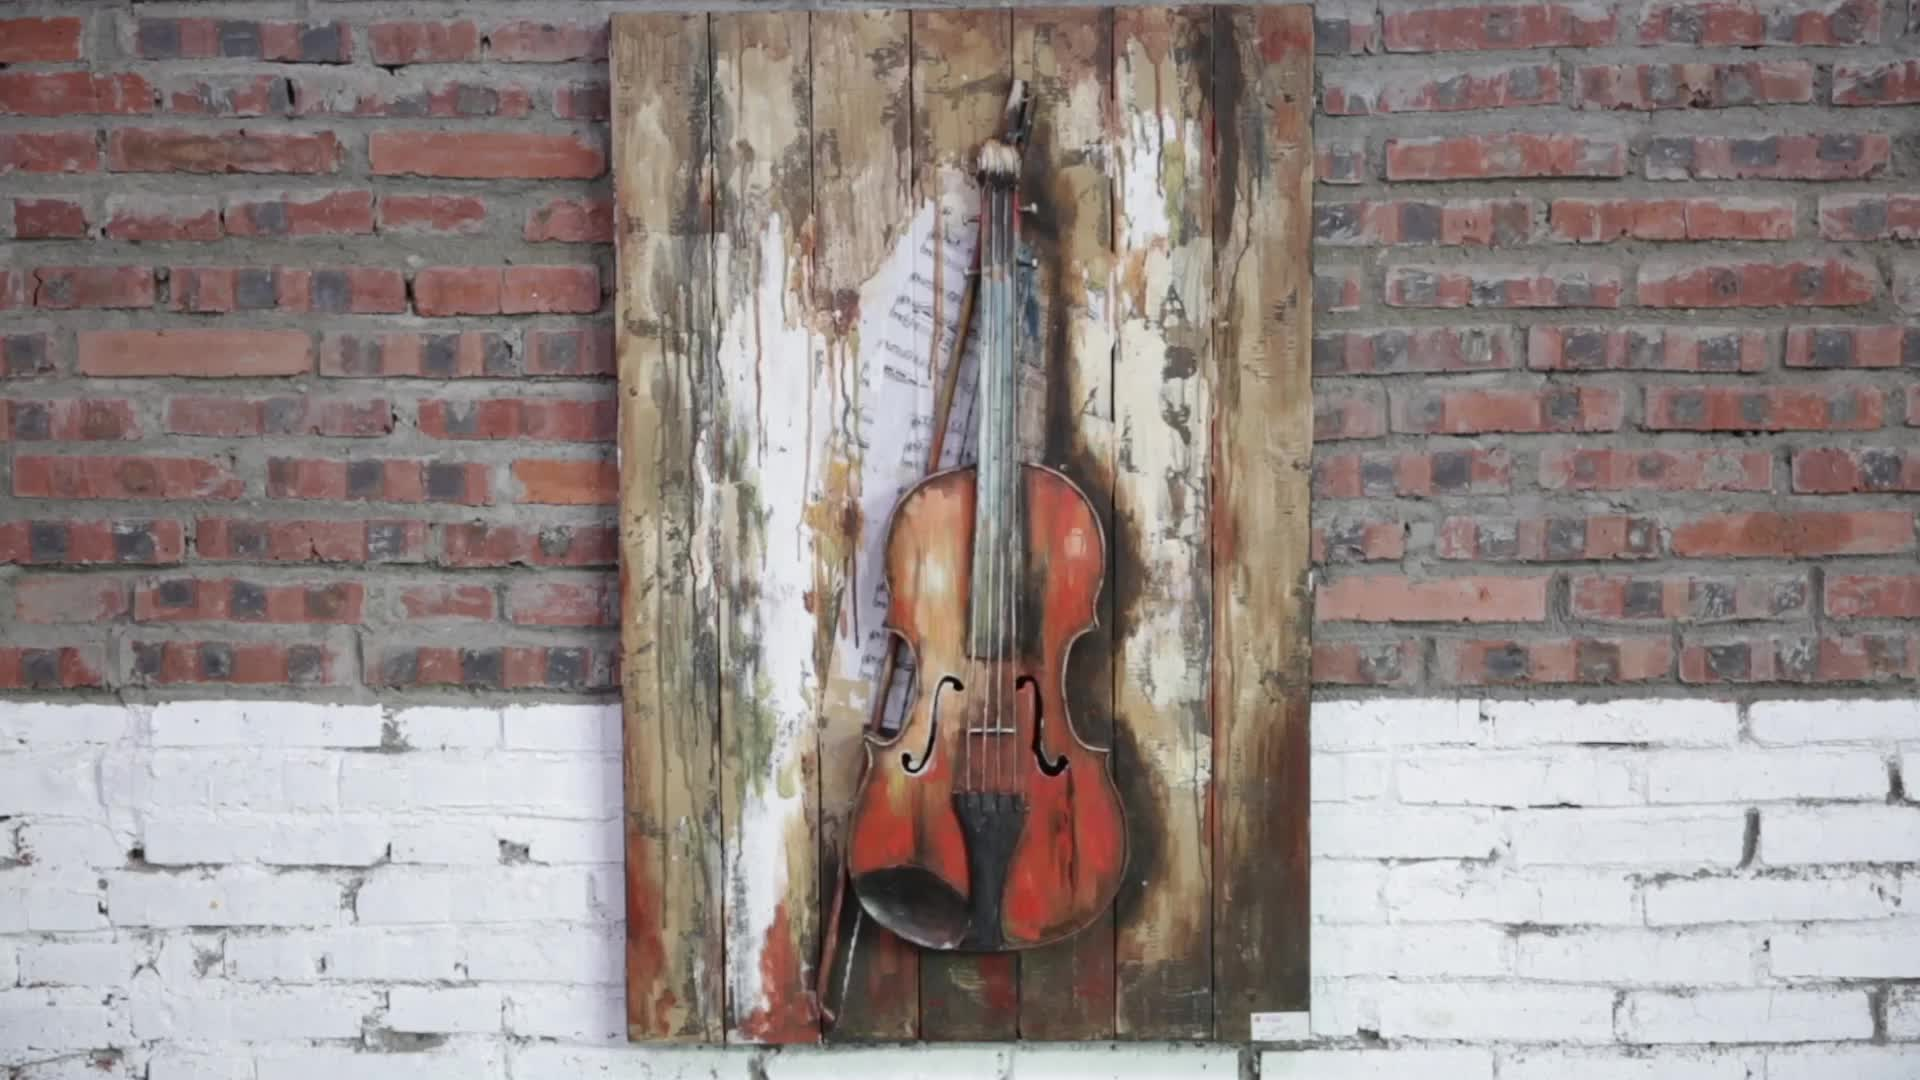 Buatan Tangan dan Minyak Lukisan Alat Musik Dinding Seni 3D Dekorasi Siap untuk Kapal